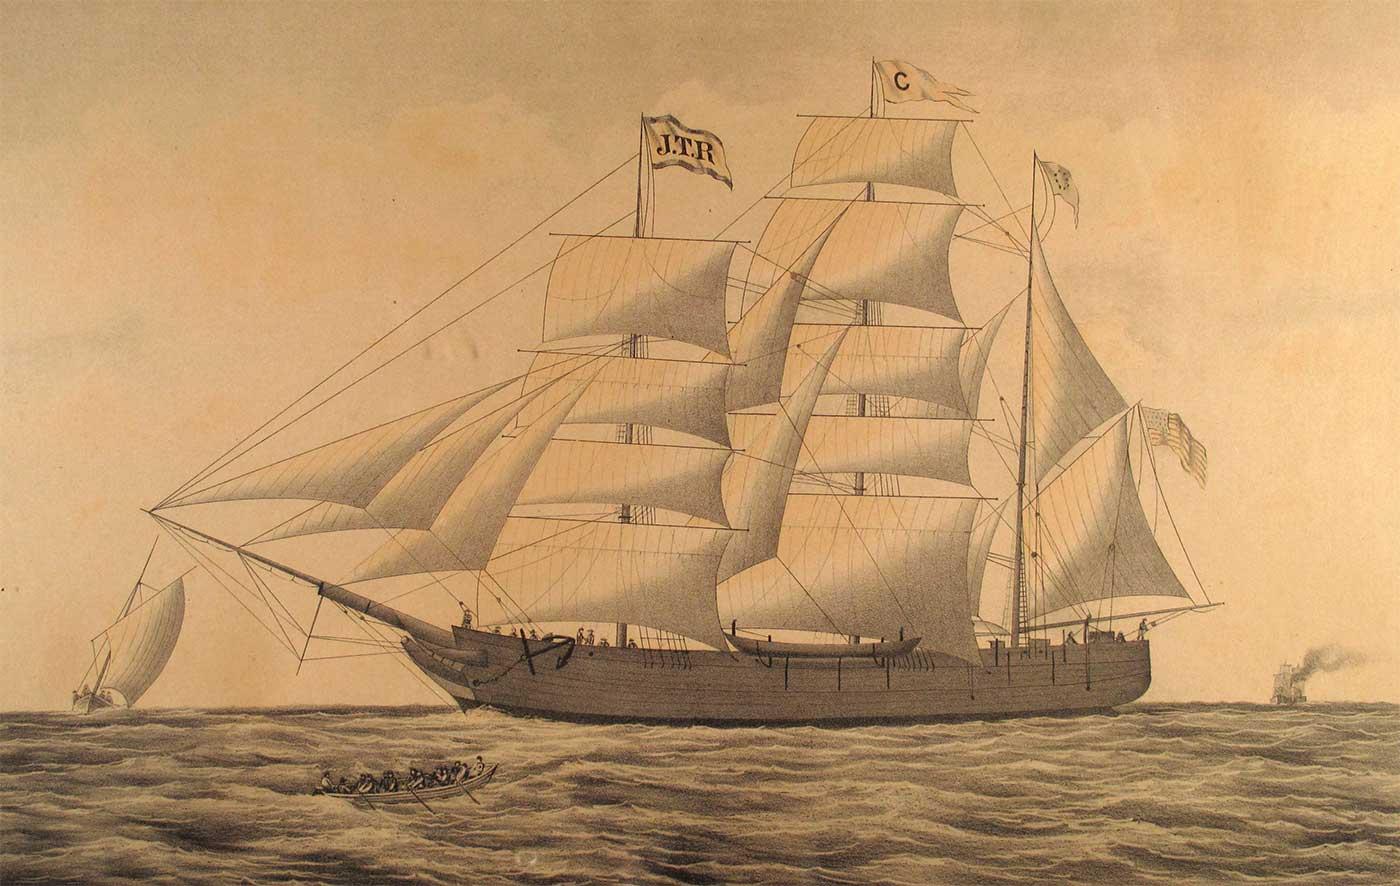 Illustration of an 19th Century sailing ship at sea. - click to view larger image